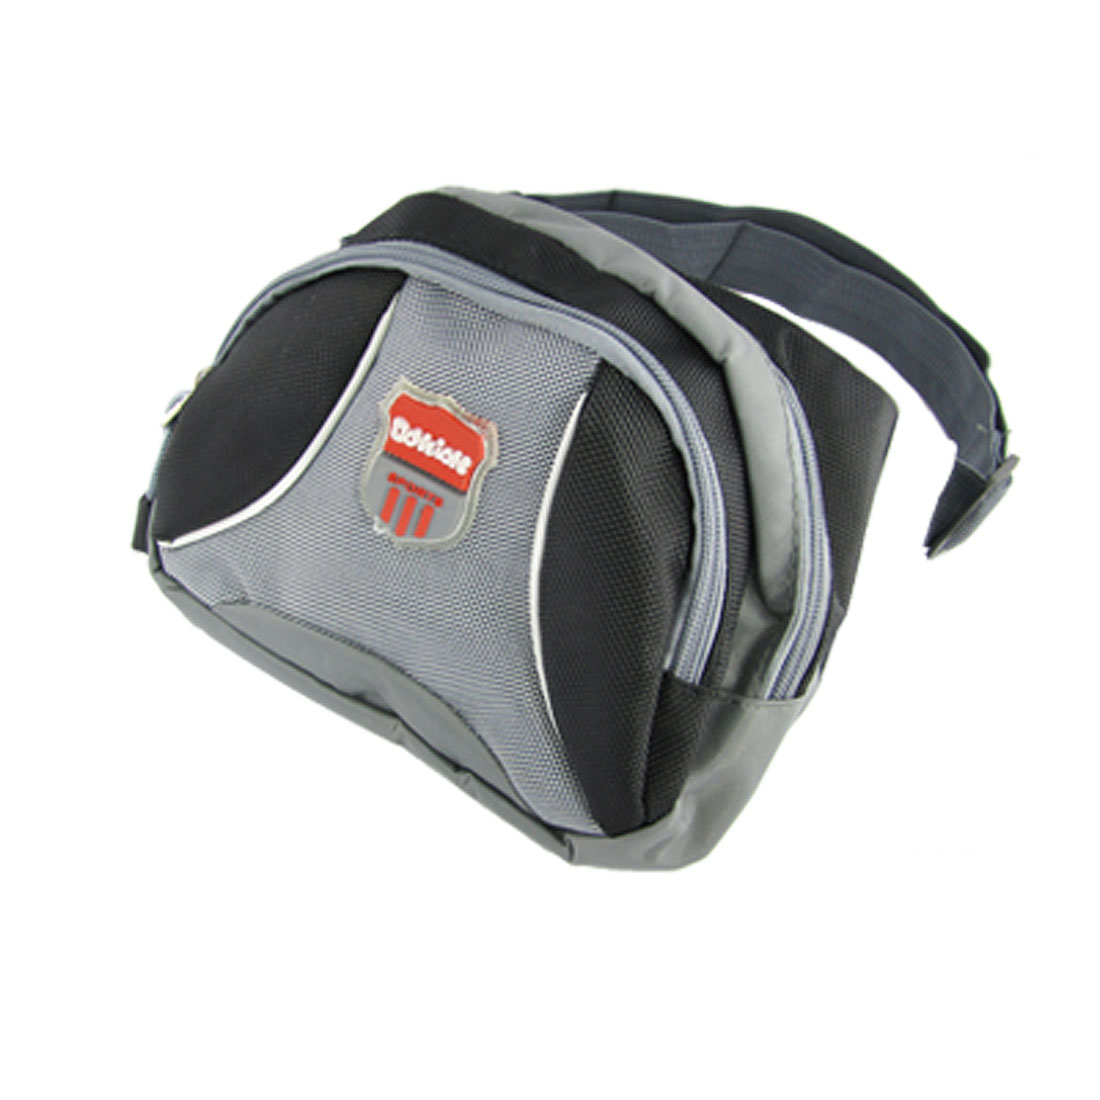 Zippered 3 Compartments Nylon Waist Pack Black Gray